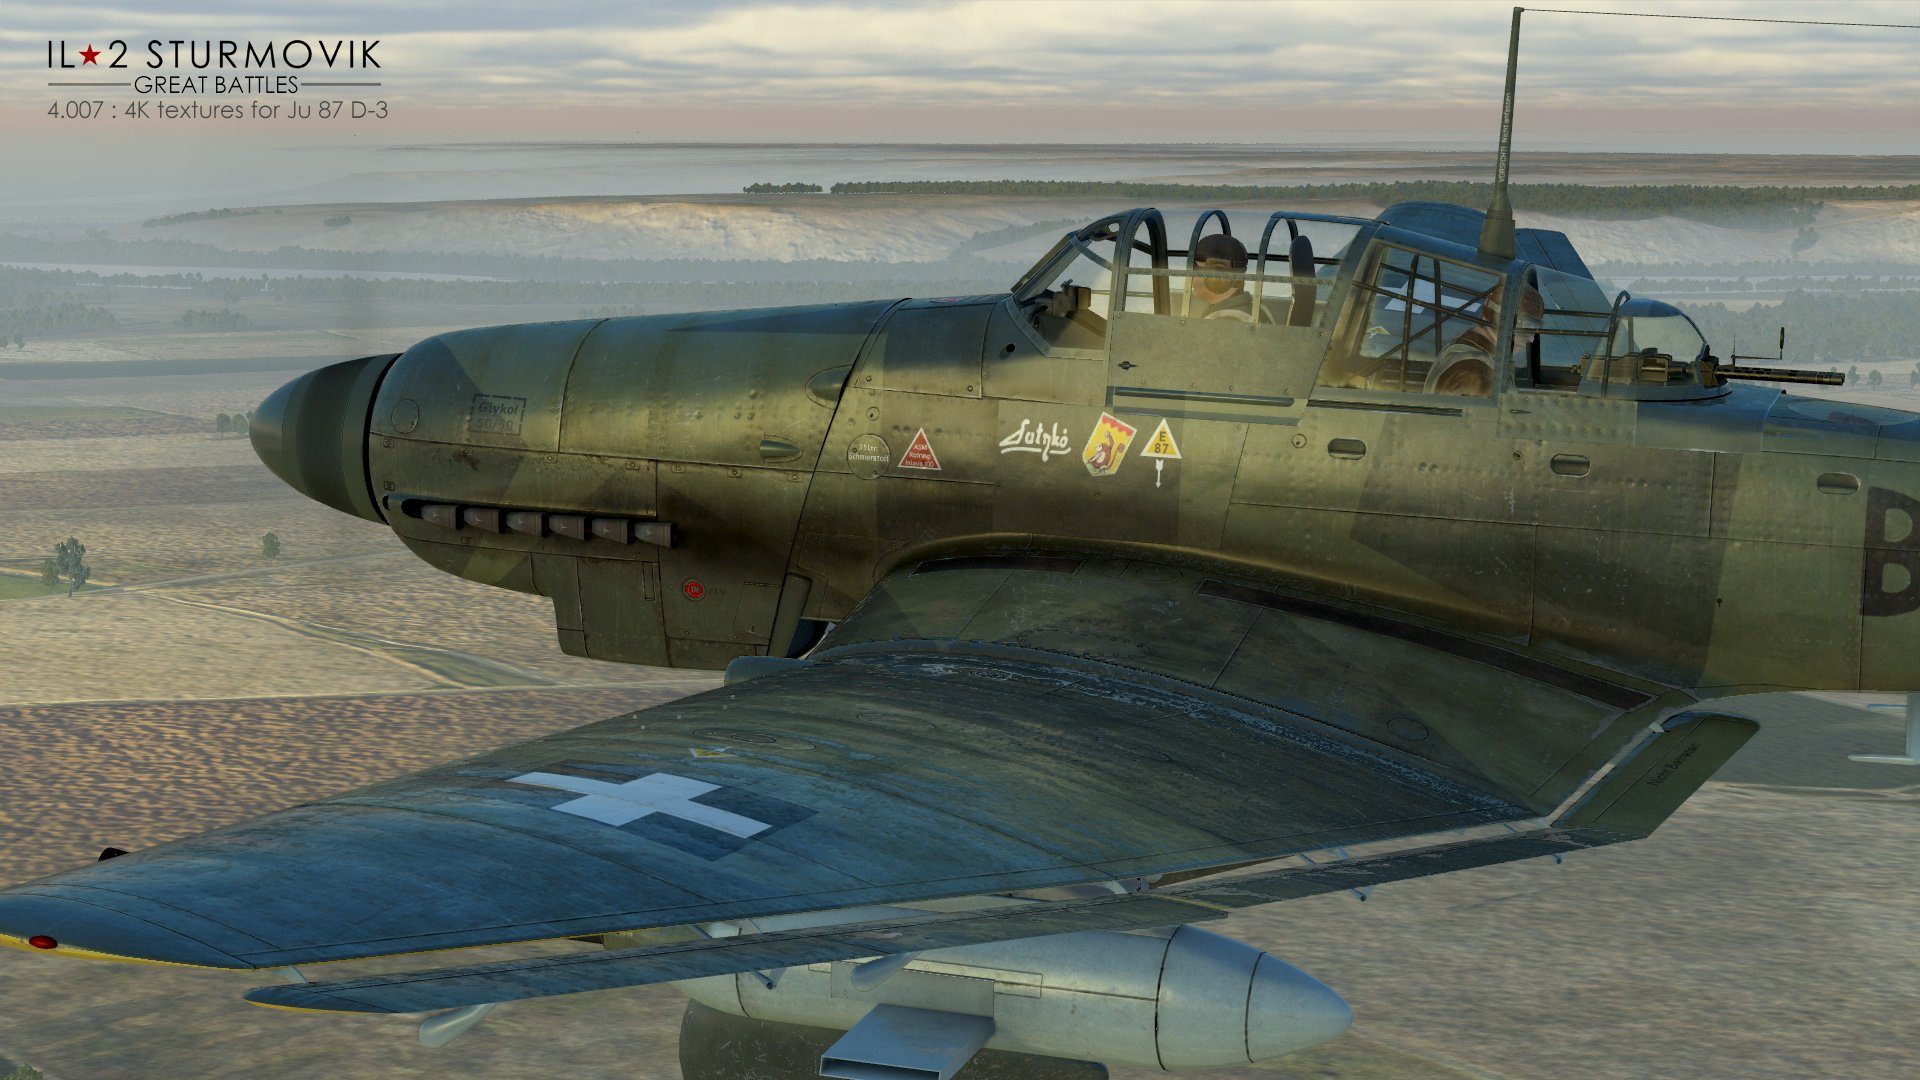 Il-2 Great Battles: Patch 4.007